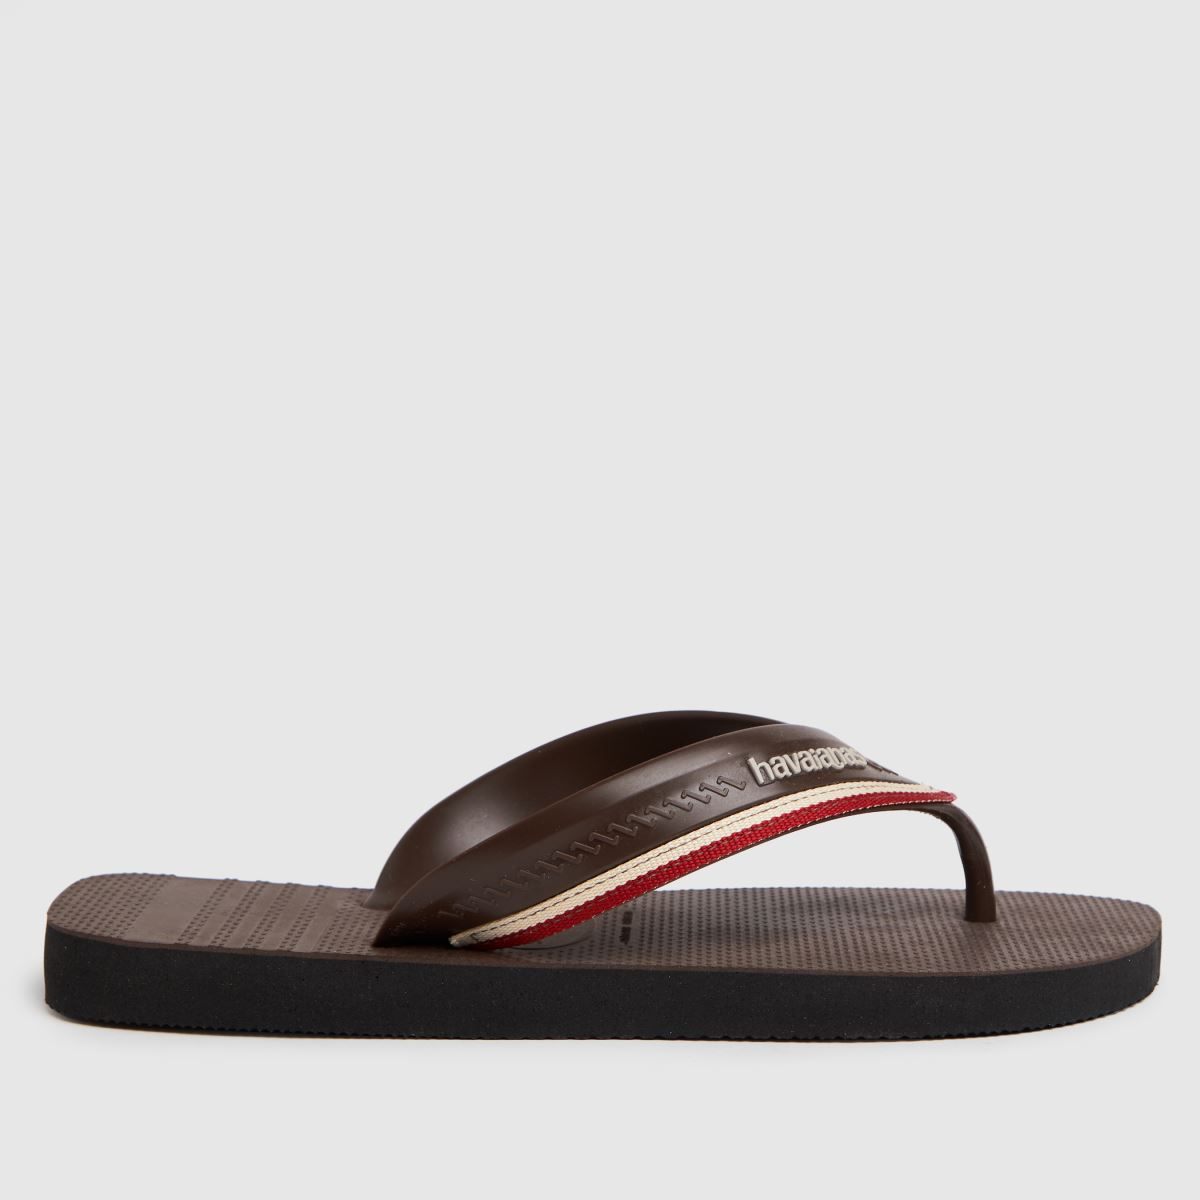 Havaianas Brown New Hybrid Free Sandals